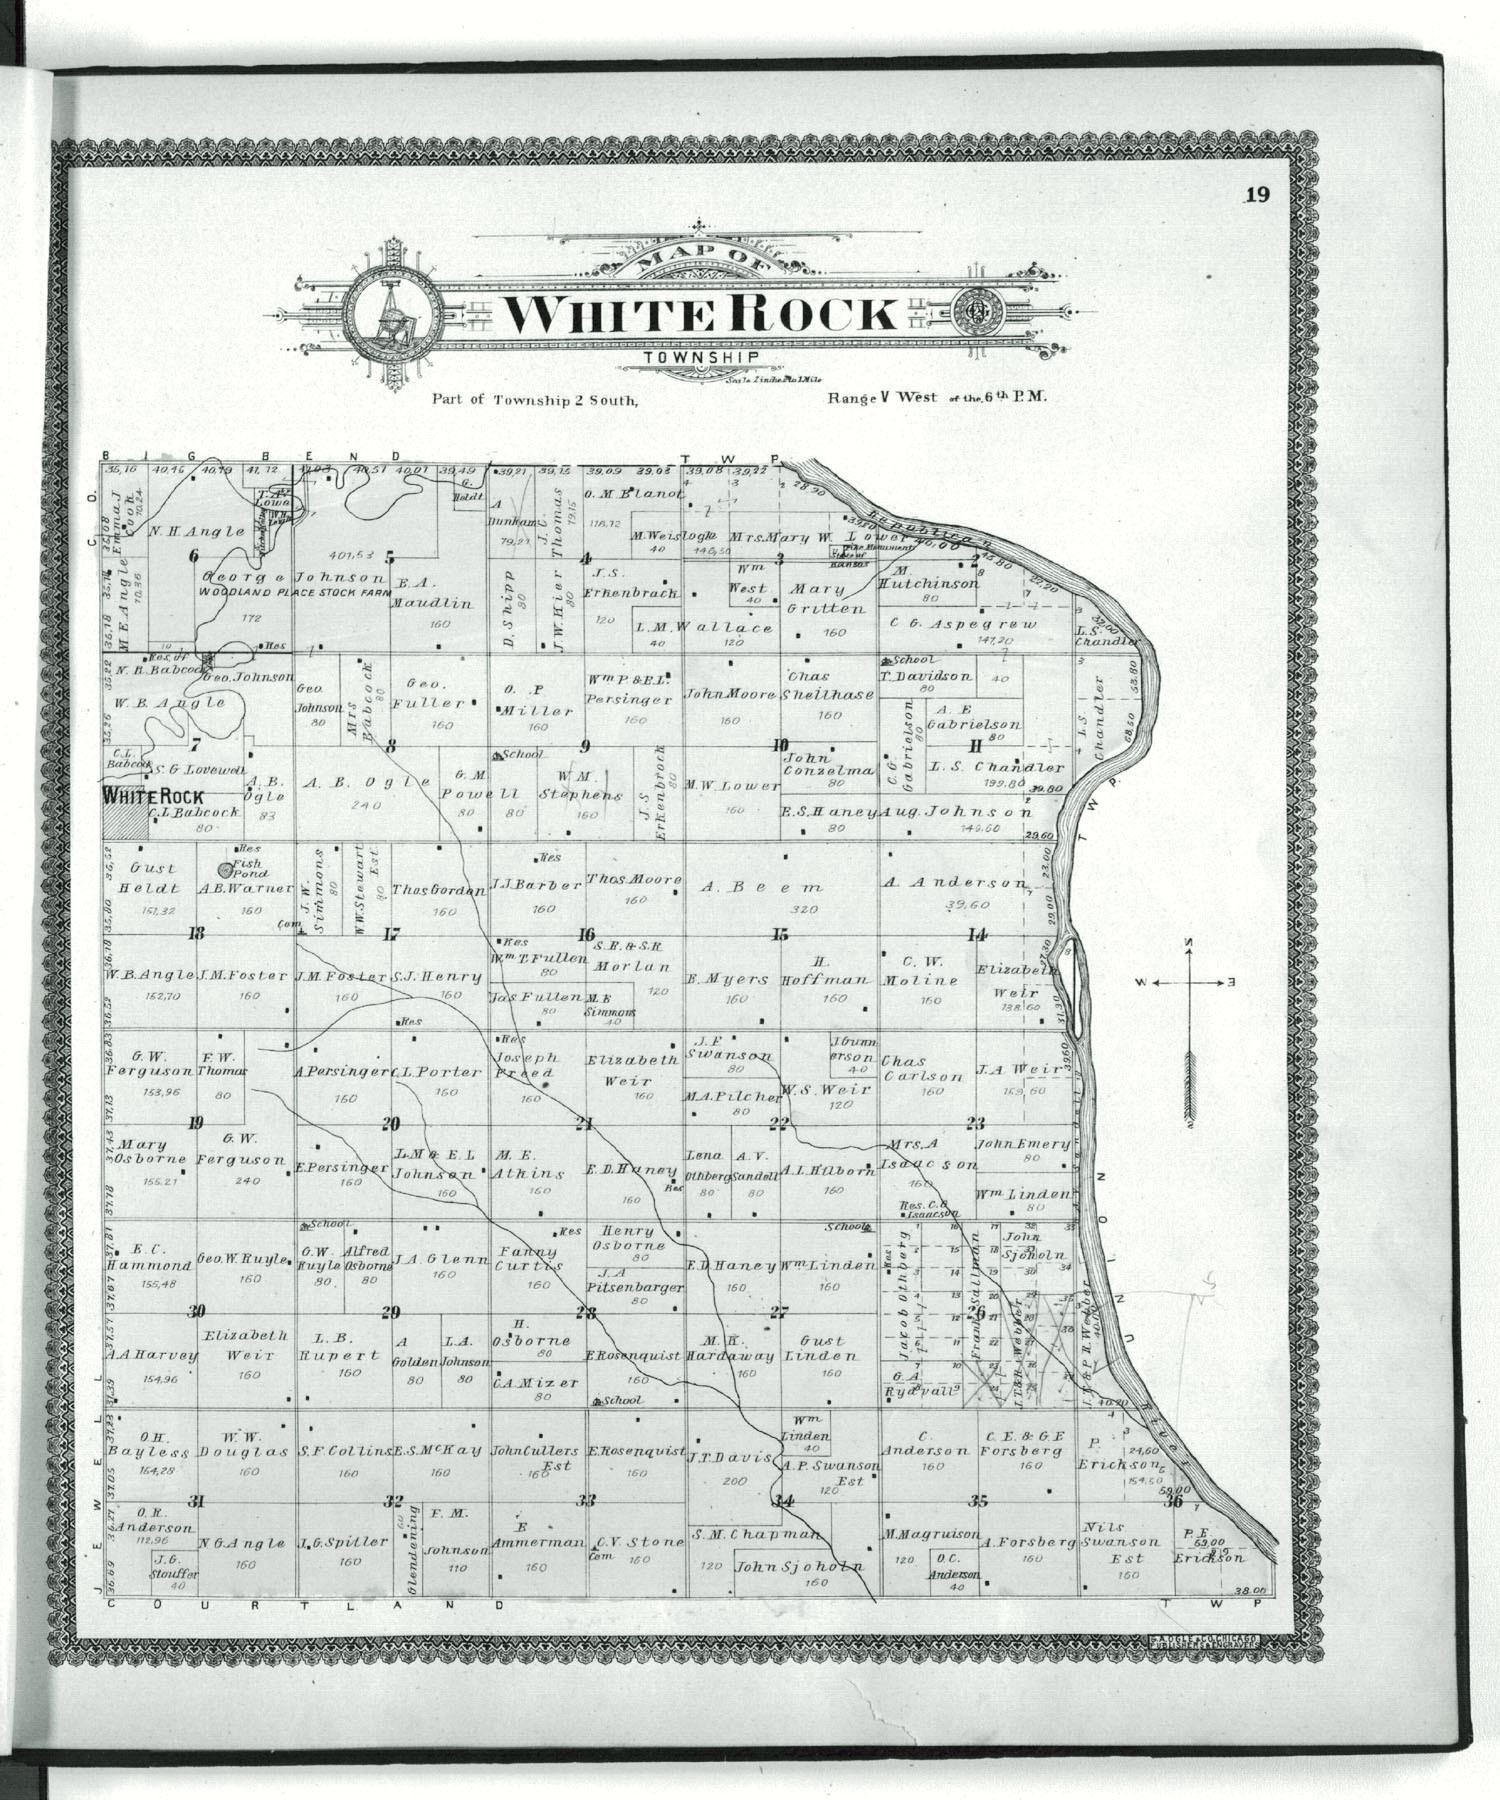 Standard atlas of Republic County, Kansas - 19